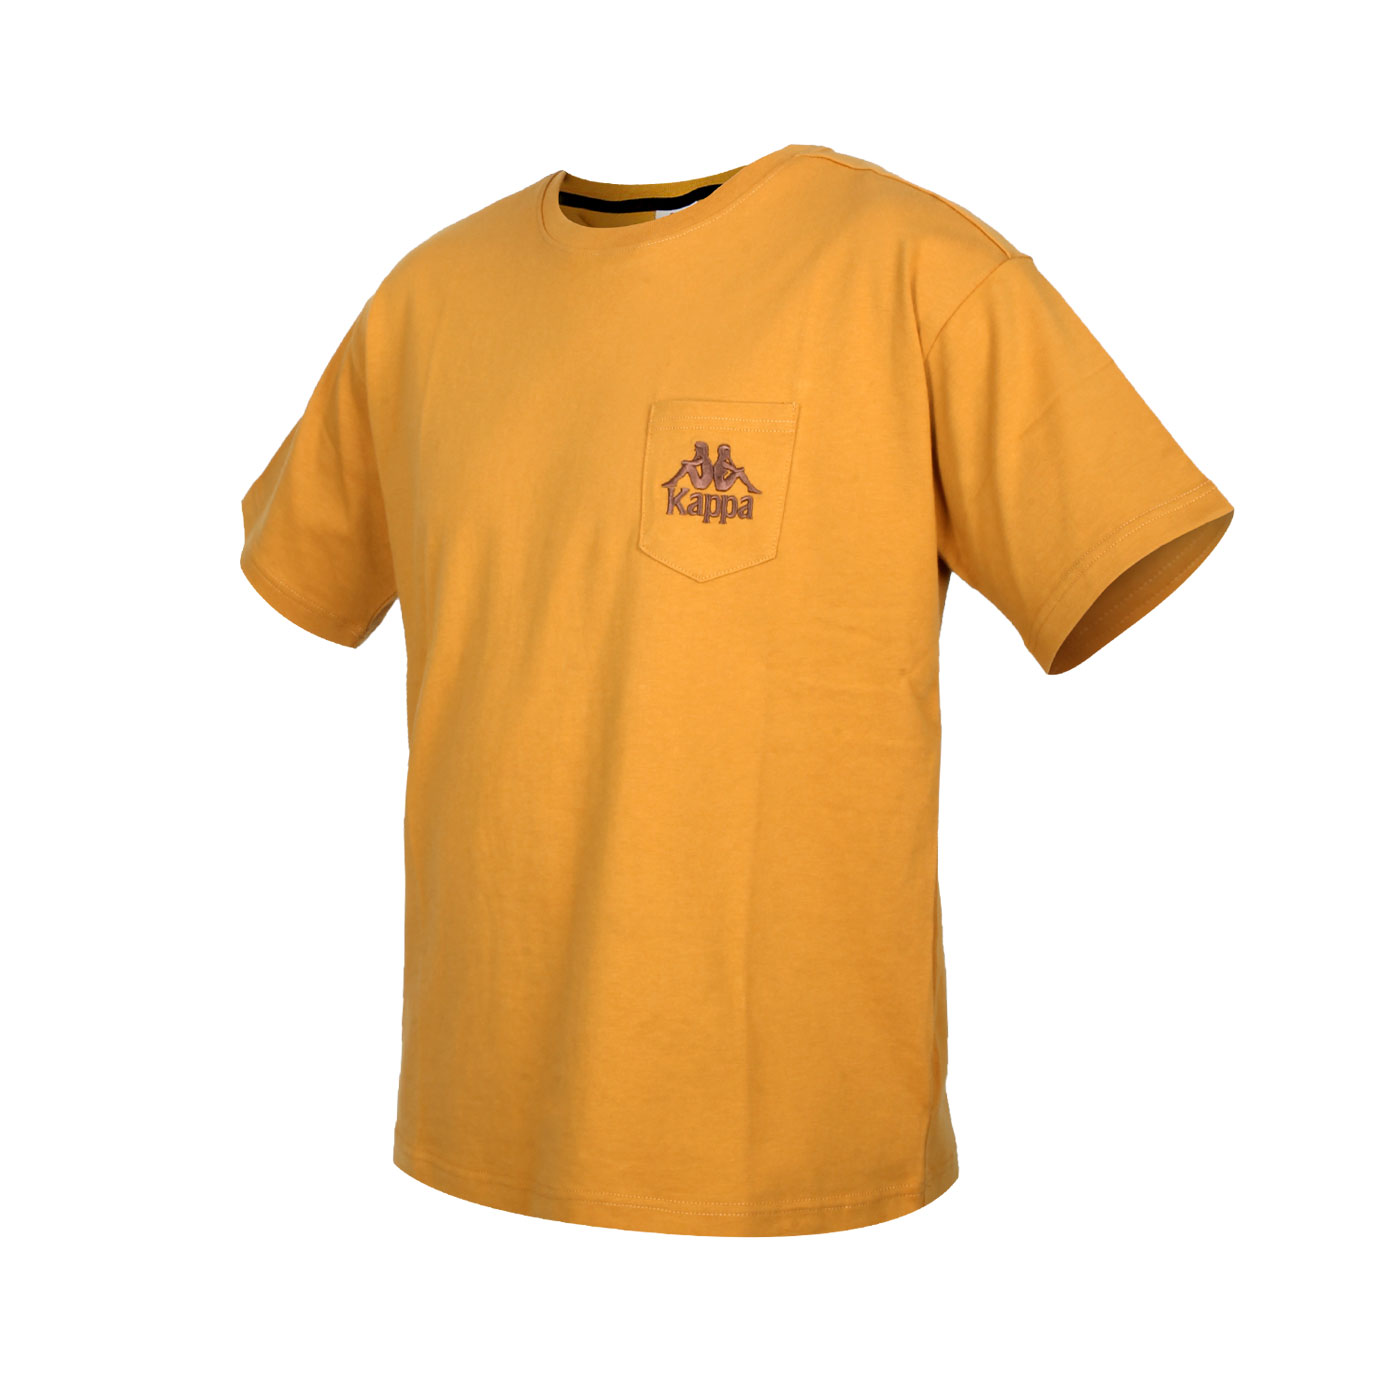 KAPPA 男款短袖T恤 32191TW-Z07 - 棕褐